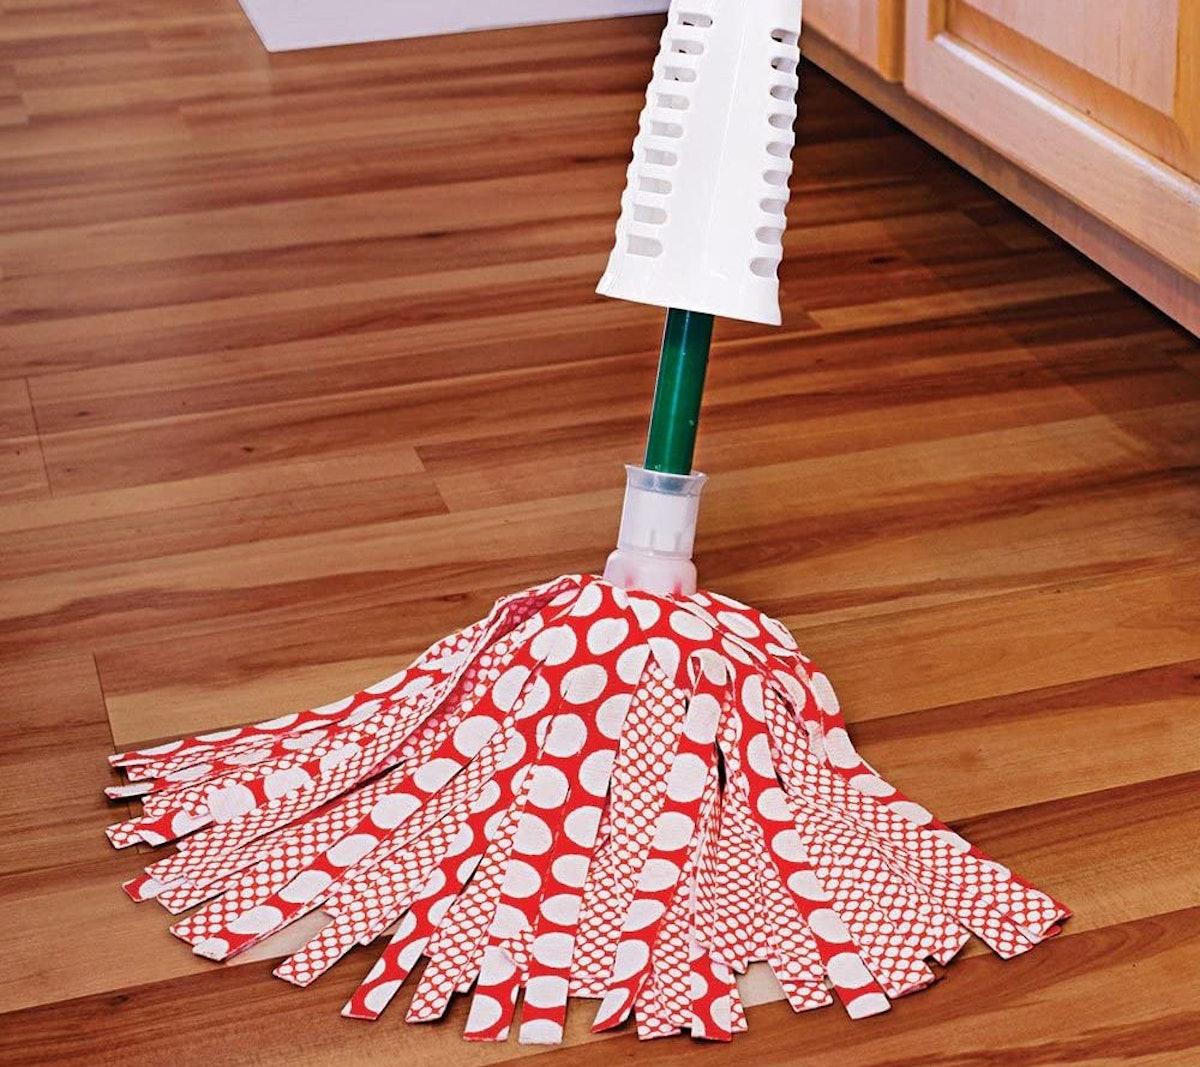 Libman Wonder Mop & Refills Kit